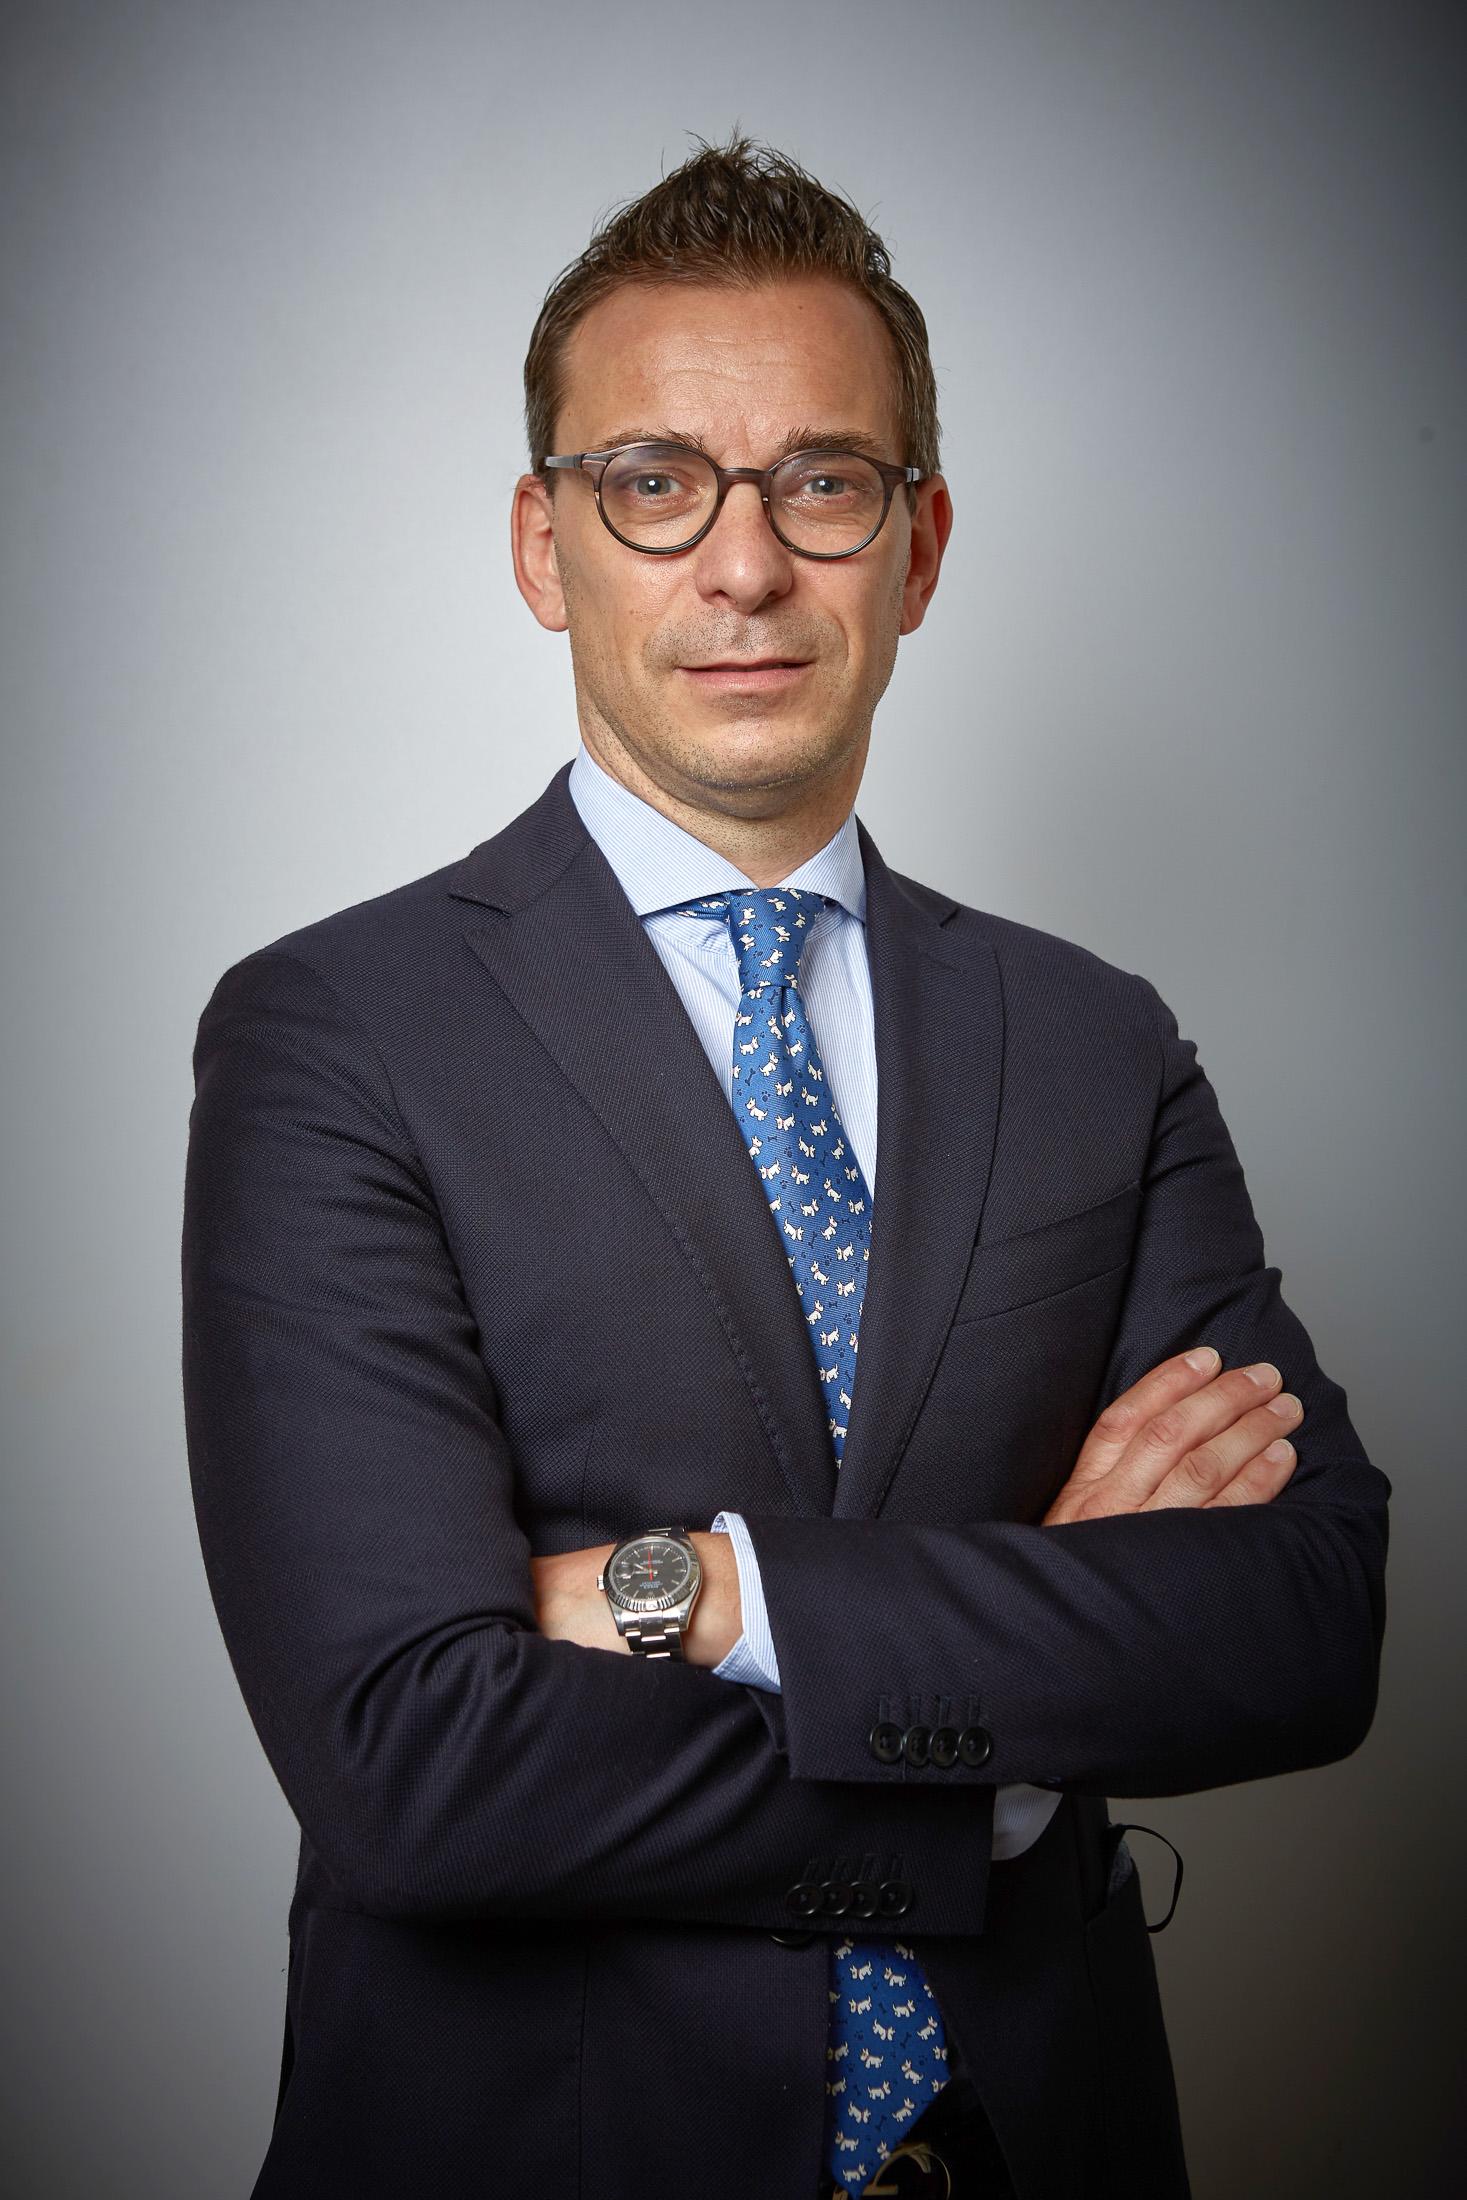 Dario Lenarduzzi